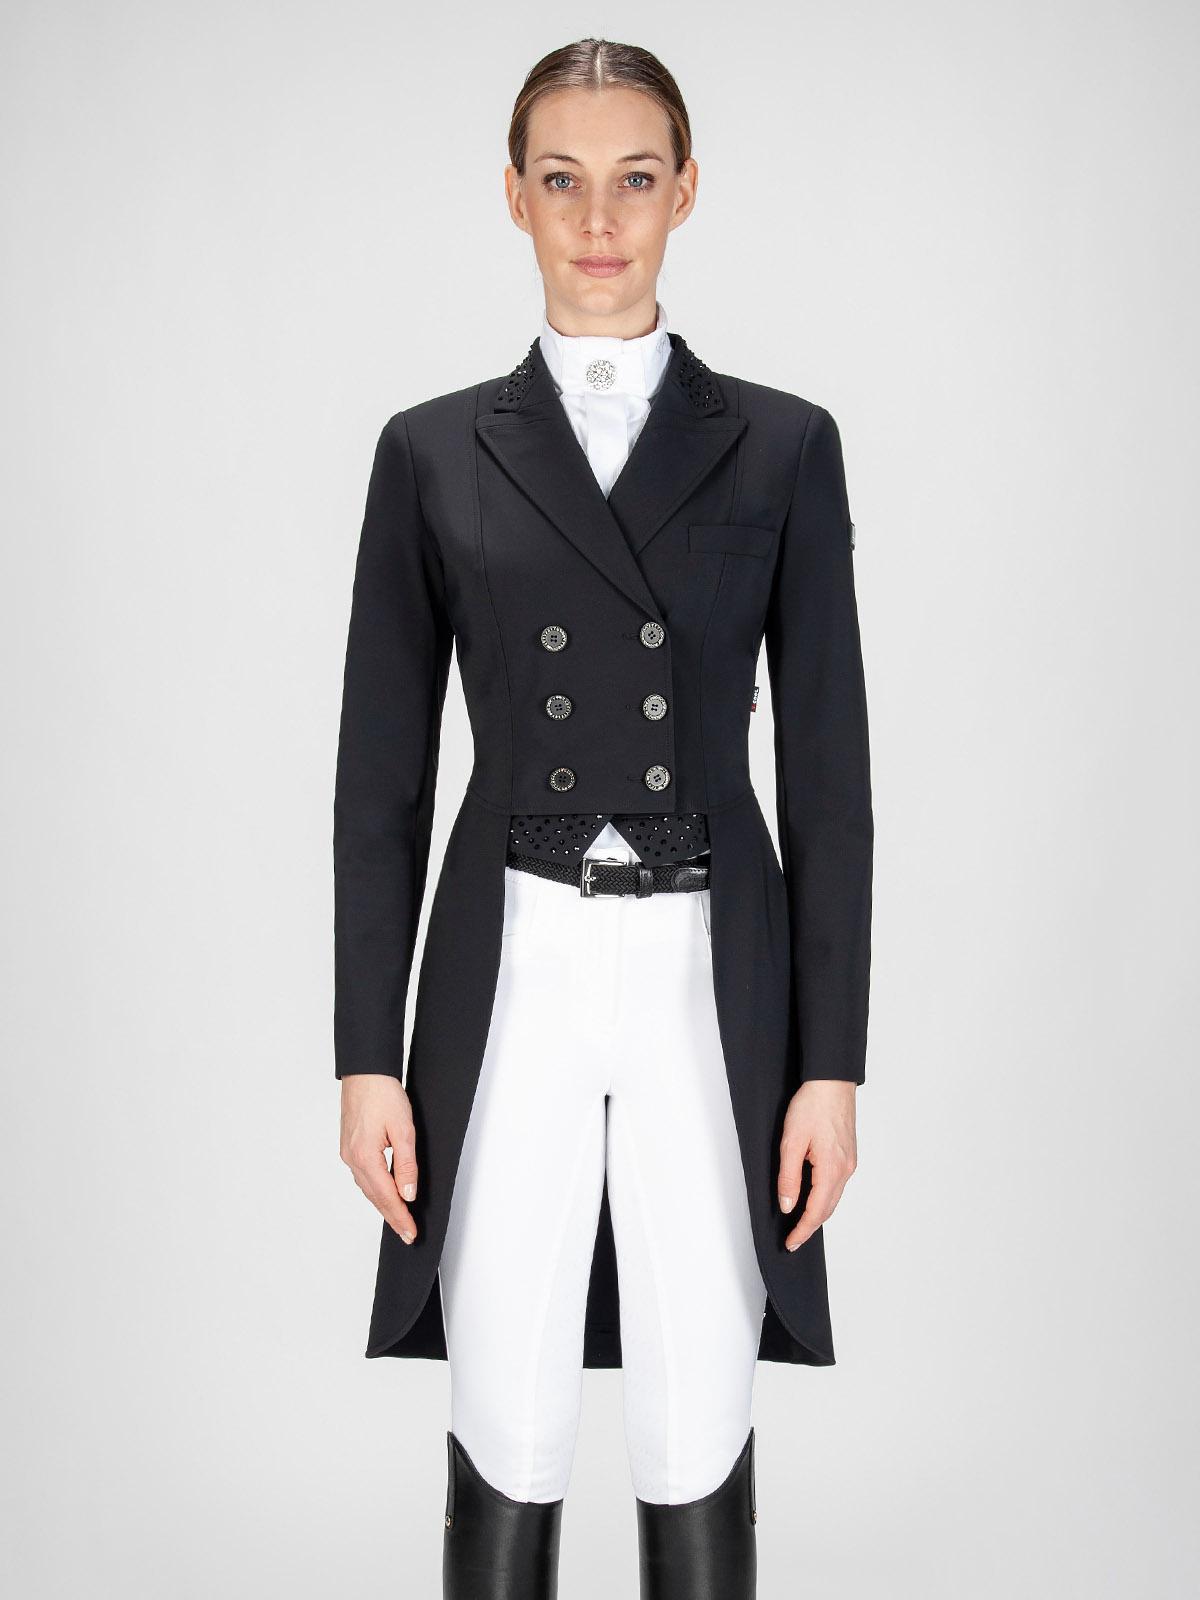 MARILYN - Women's Dressage Tail Coat X-Cool Evo 1